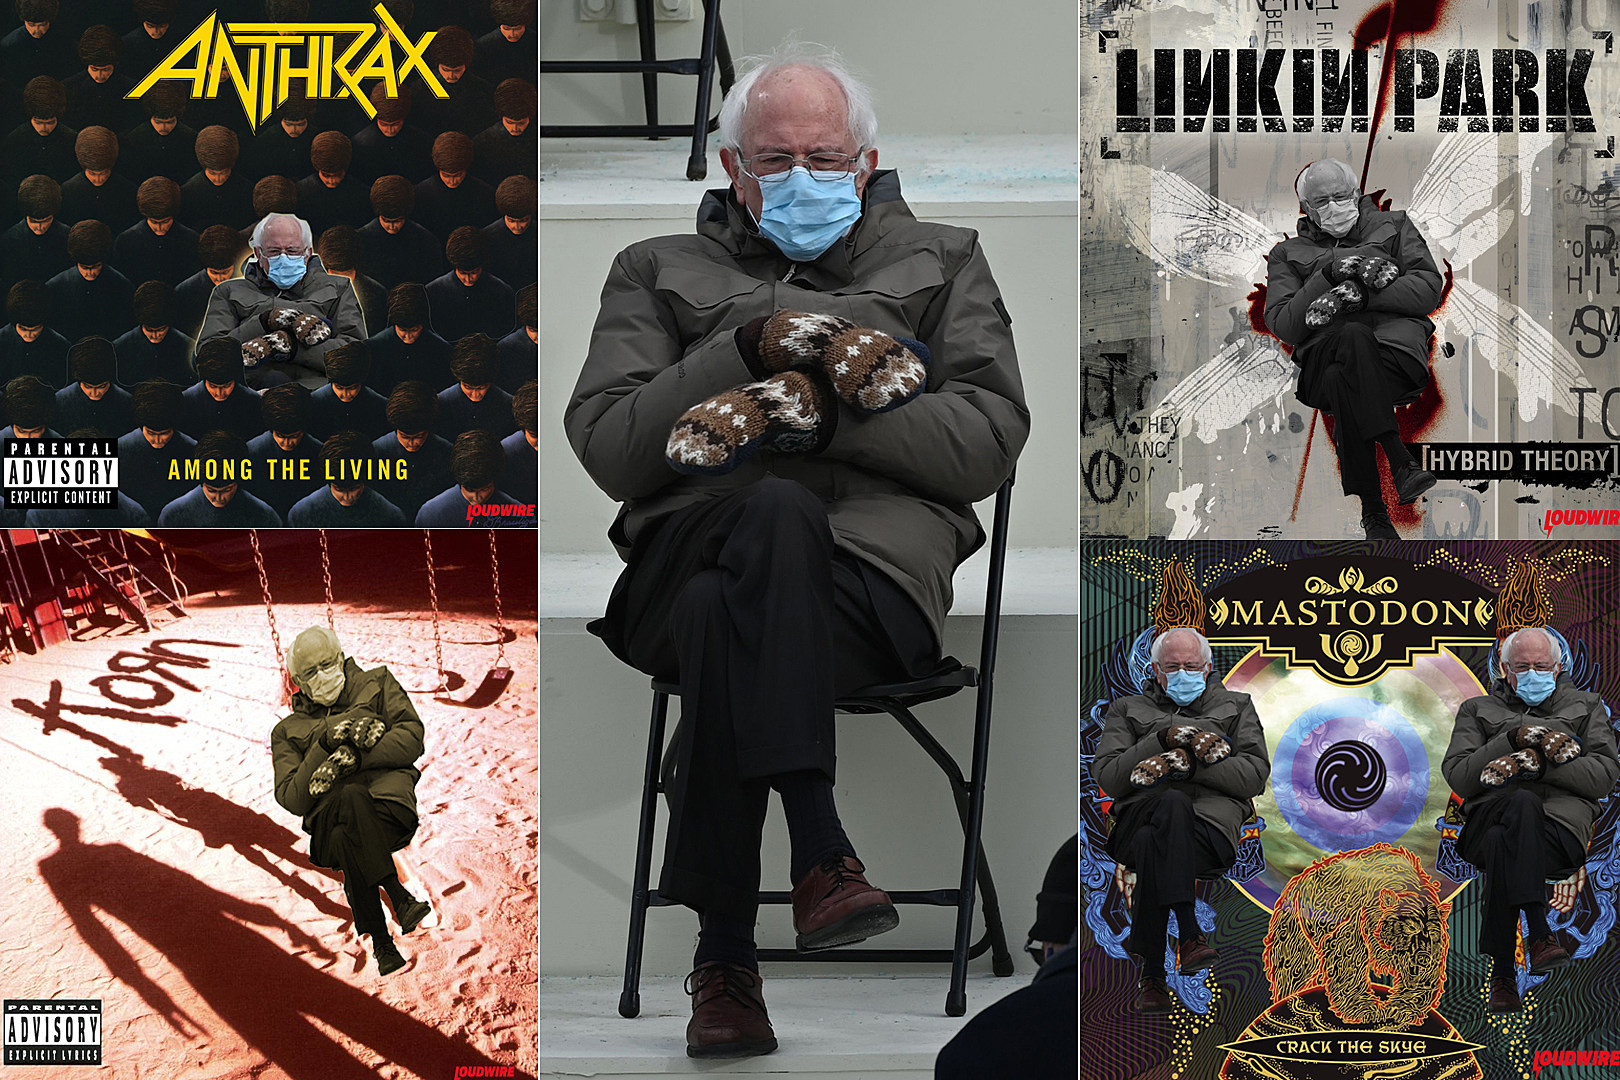 45 Rock + Metal Album Covers: Inauguration Day Bernie Sanders